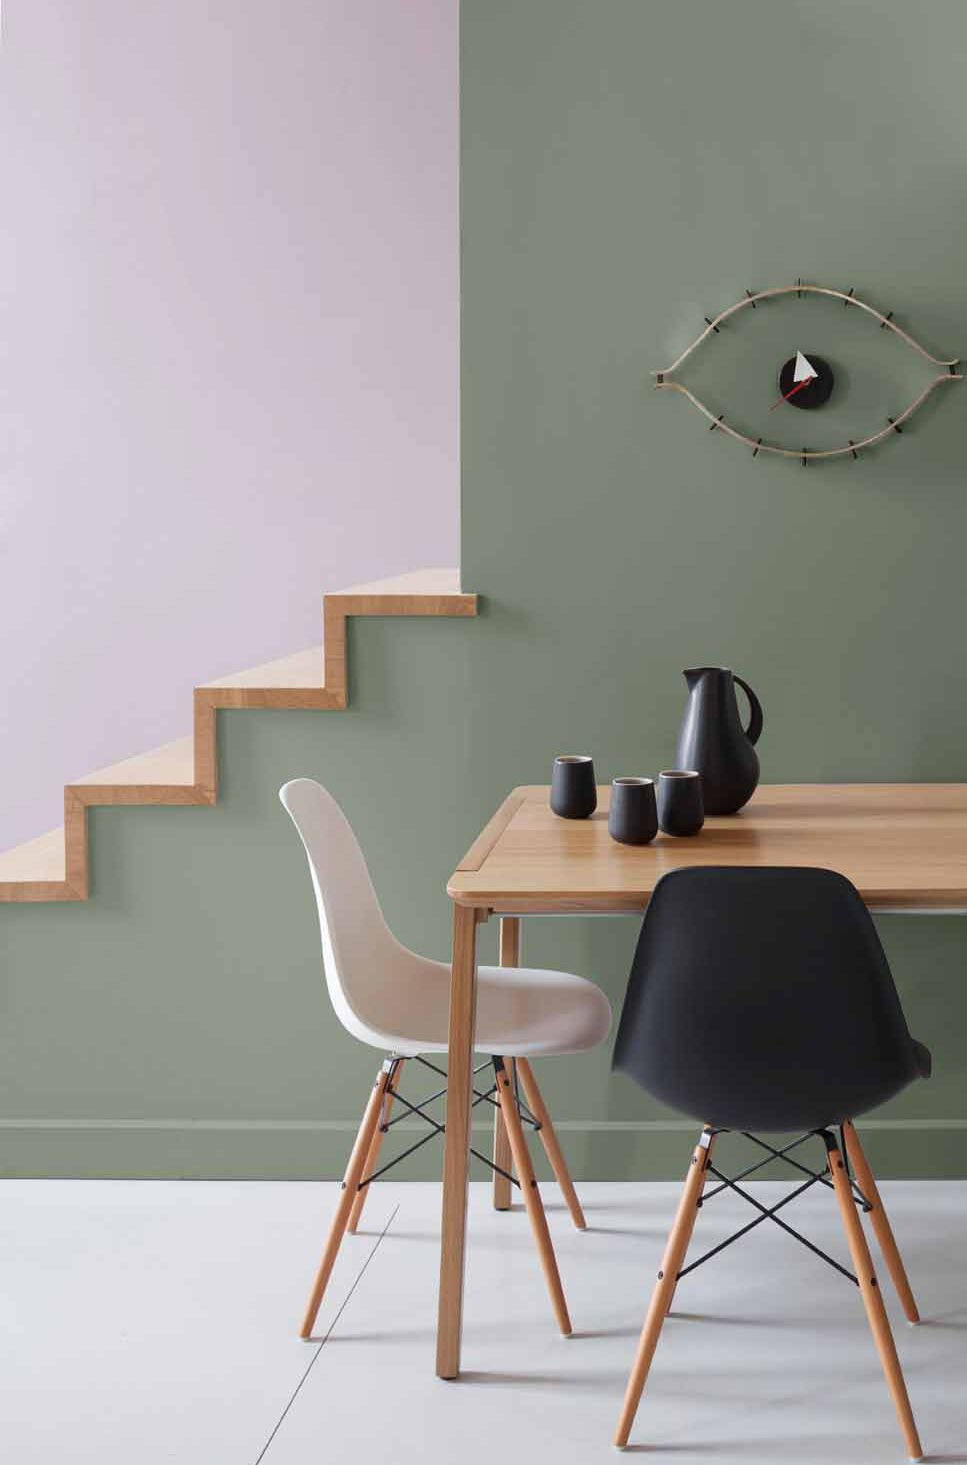 rose blush salle à manger escalier mur kaki chaise scandinave - blog déco - clem around the corner